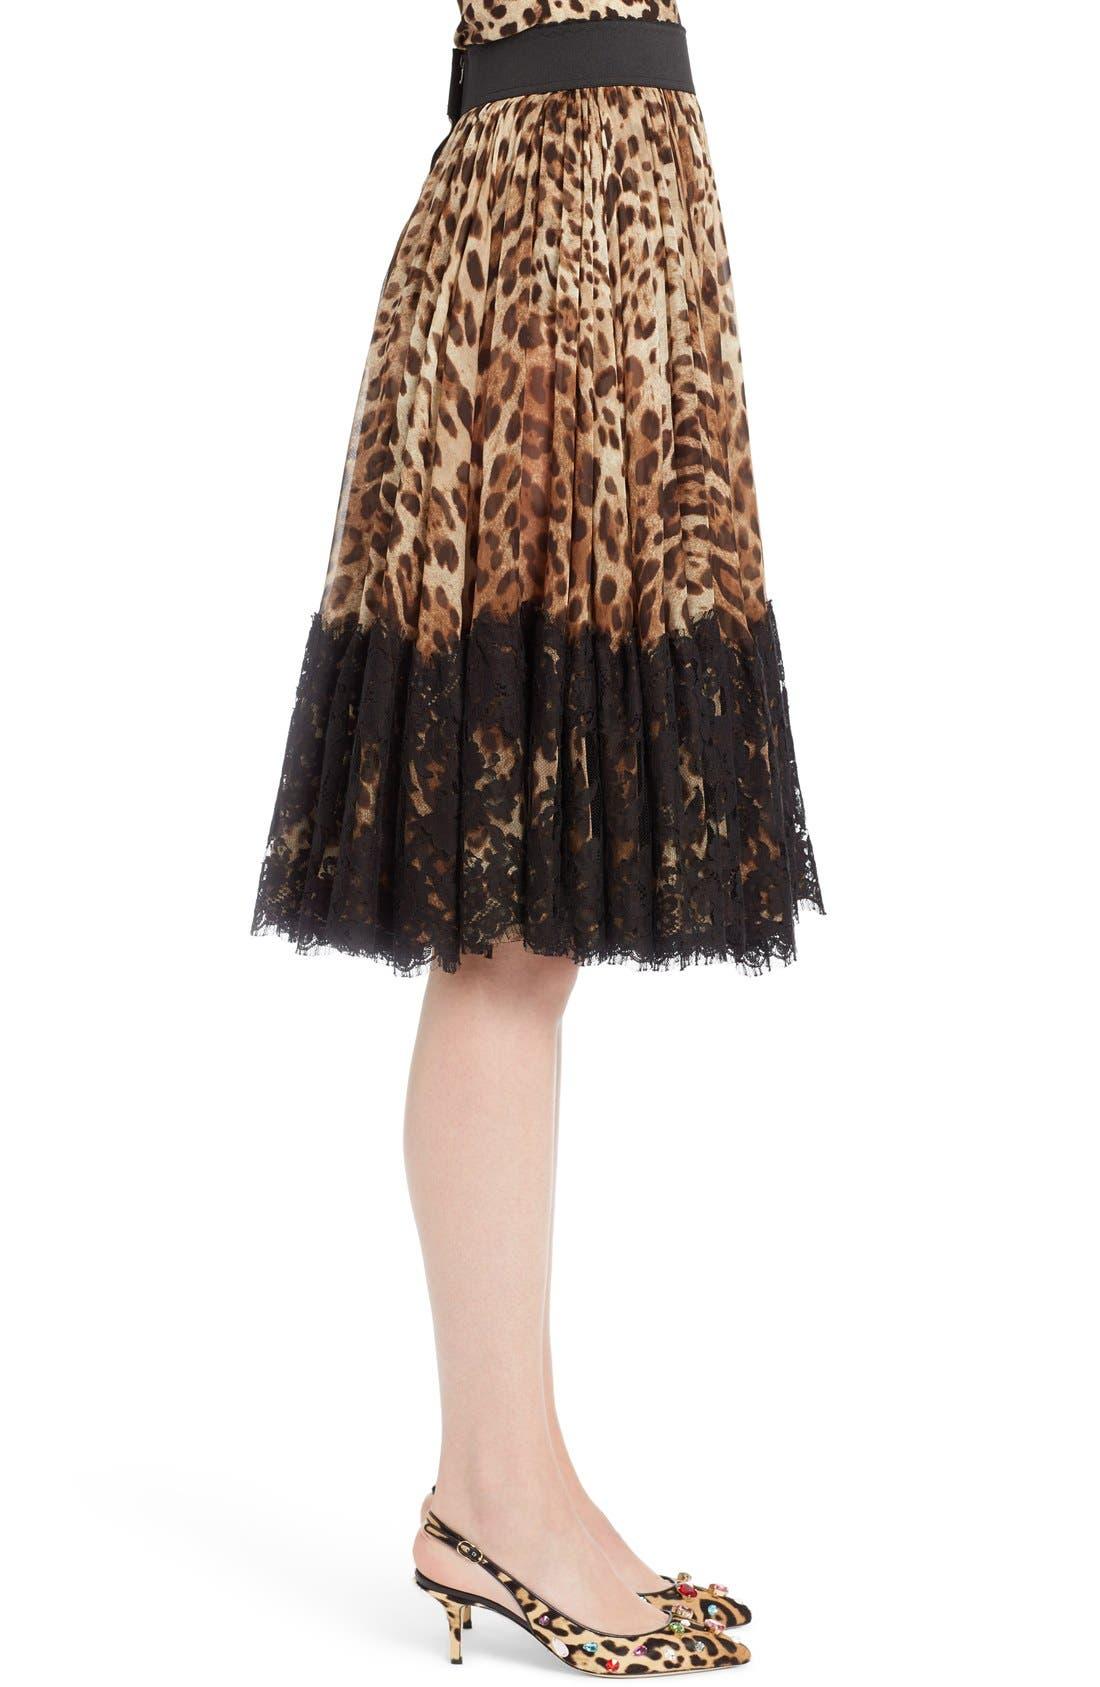 Lace Overlay Leopard Print Chiffon Full Skirt,                             Alternate thumbnail 4, color,                             Leopard